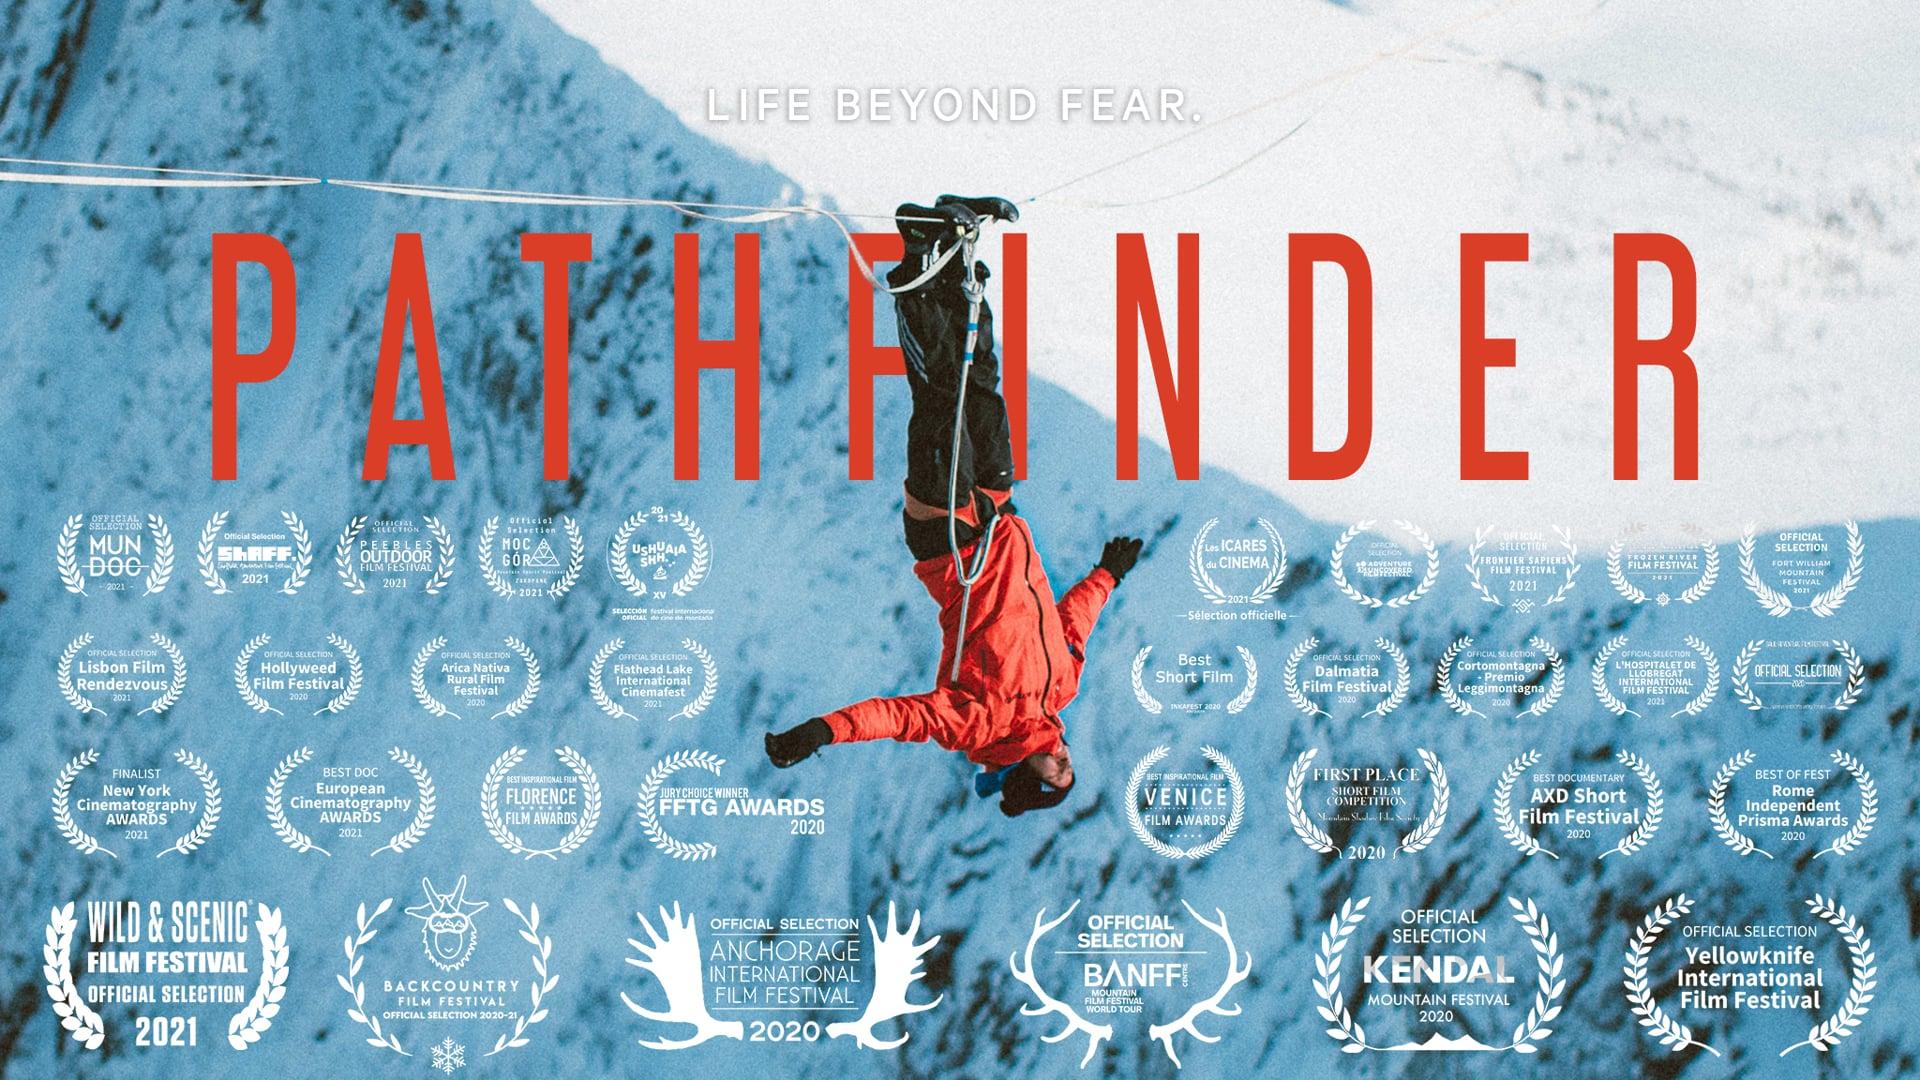 PATHFINDER - Life Beyond Fear